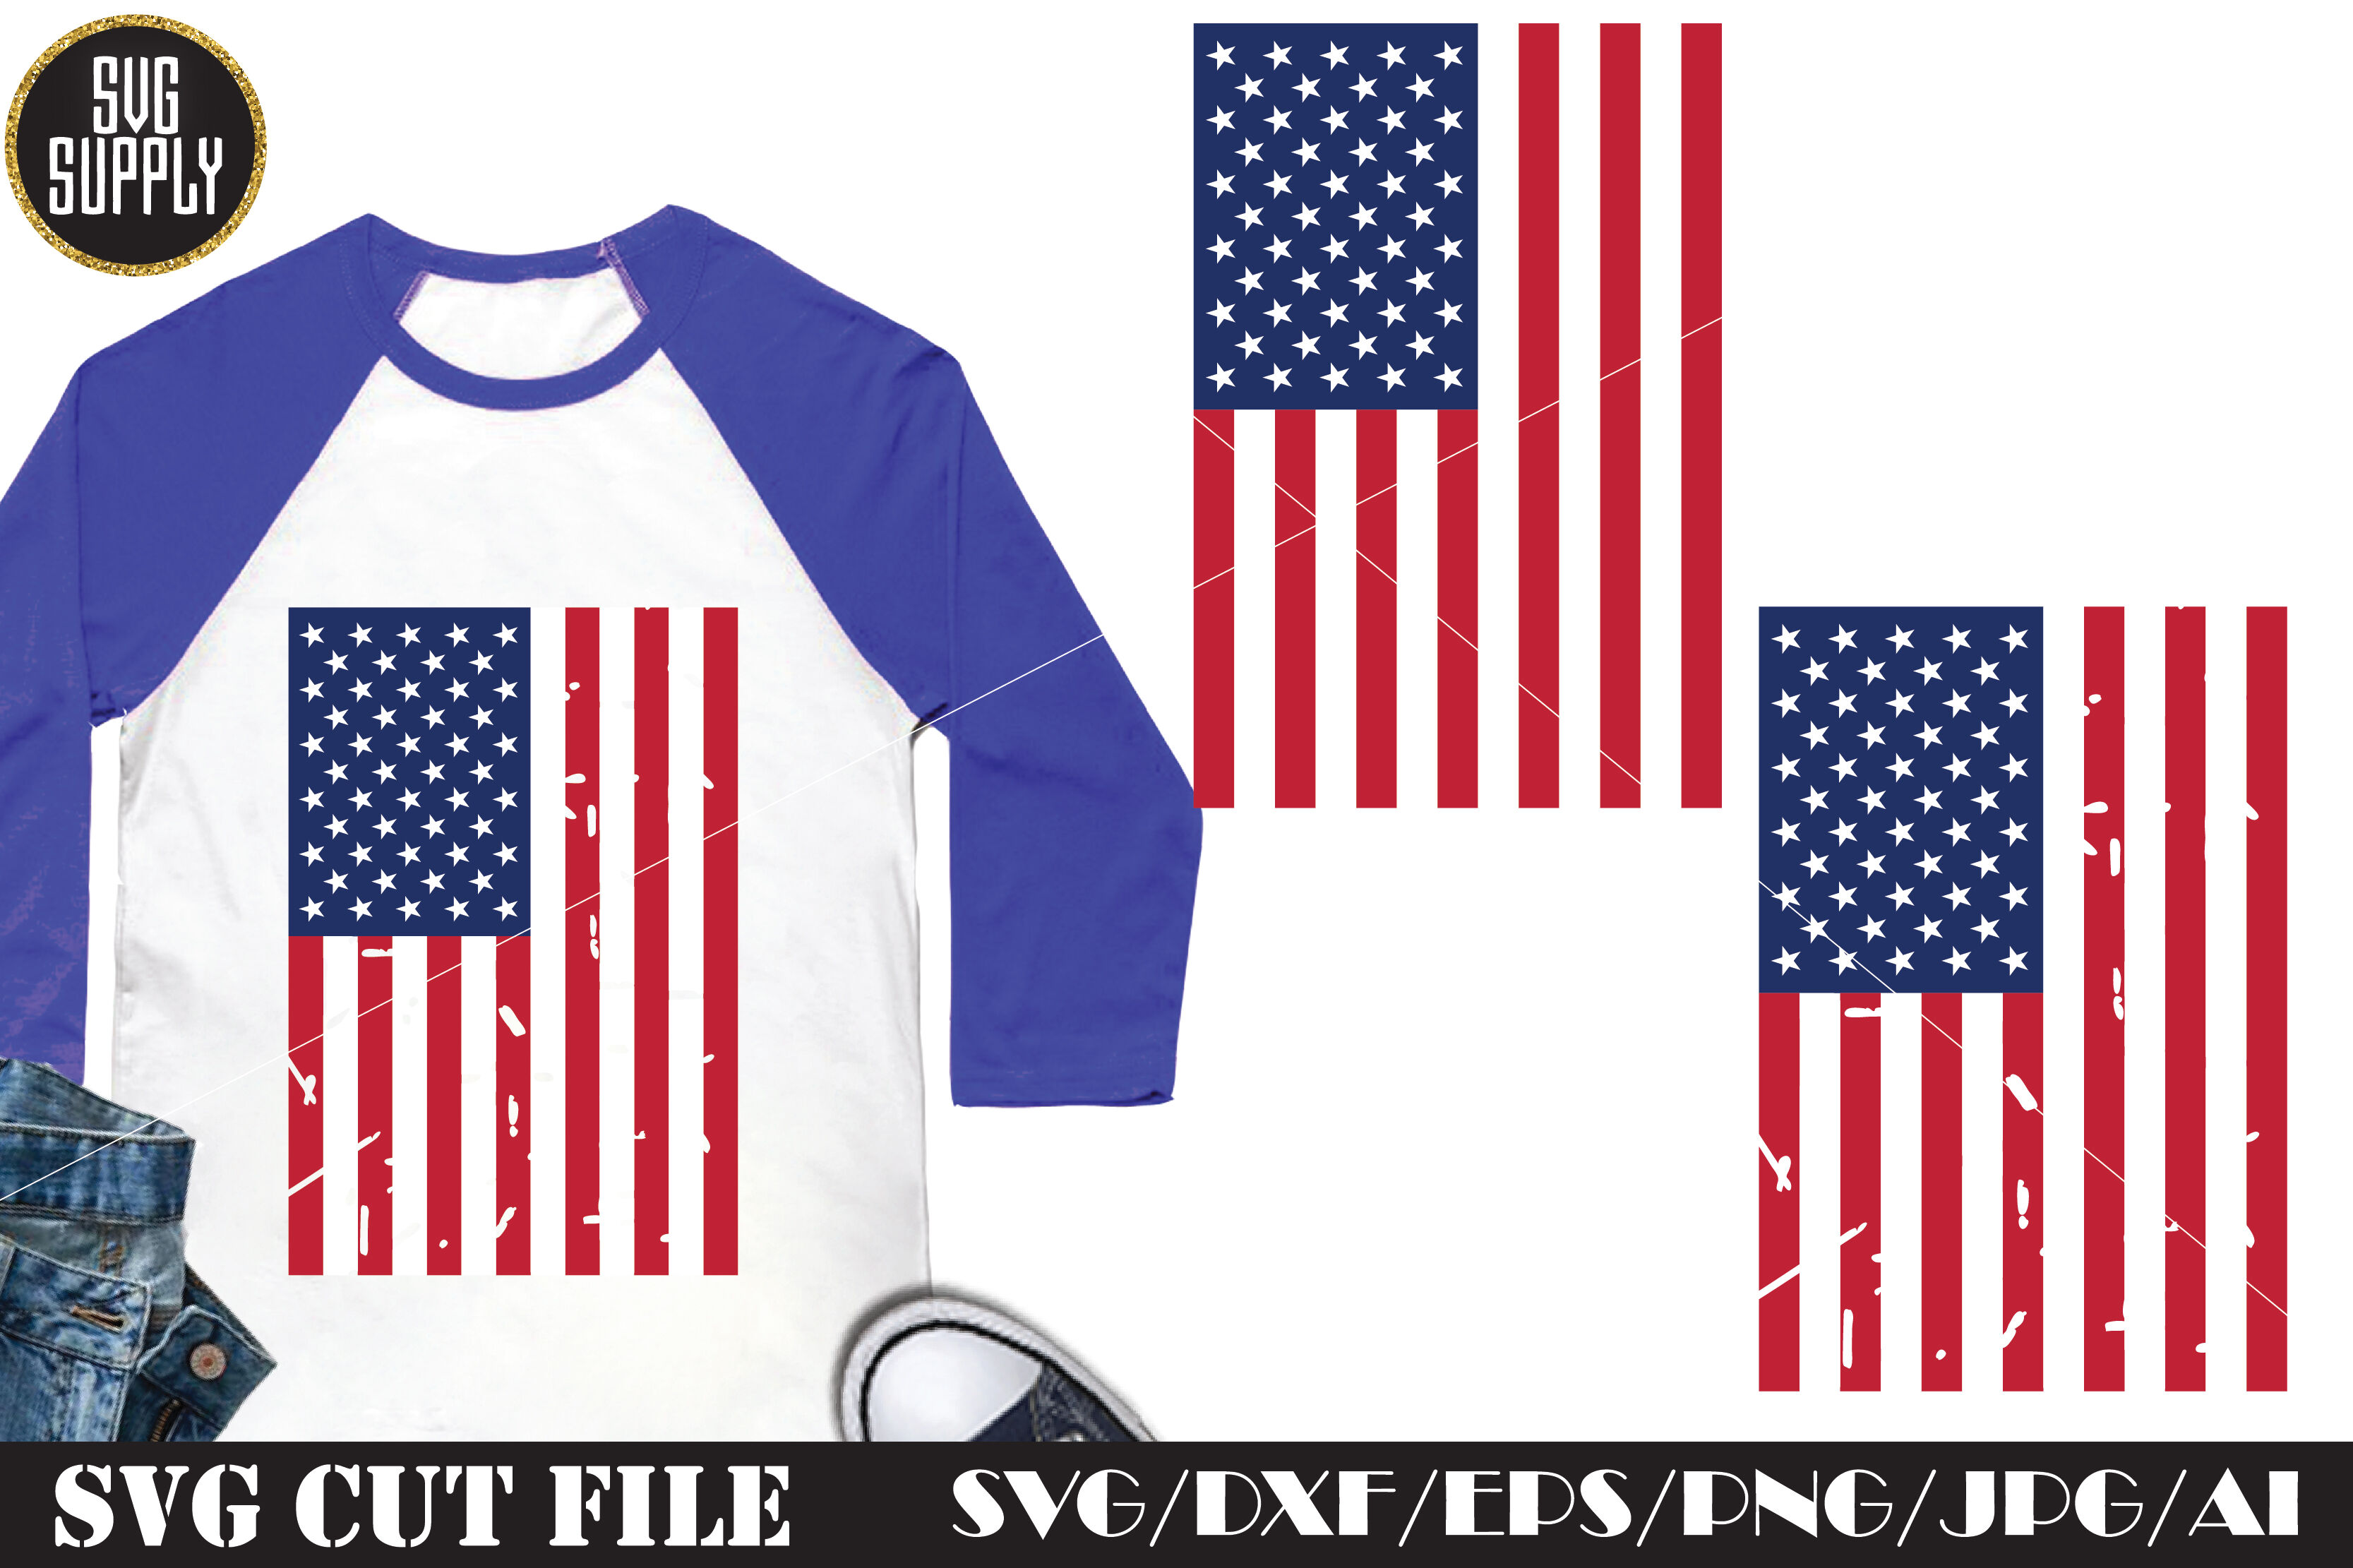 American Flag Distressed Svg Cut File By Svgsupply Thehungryjpeg Com